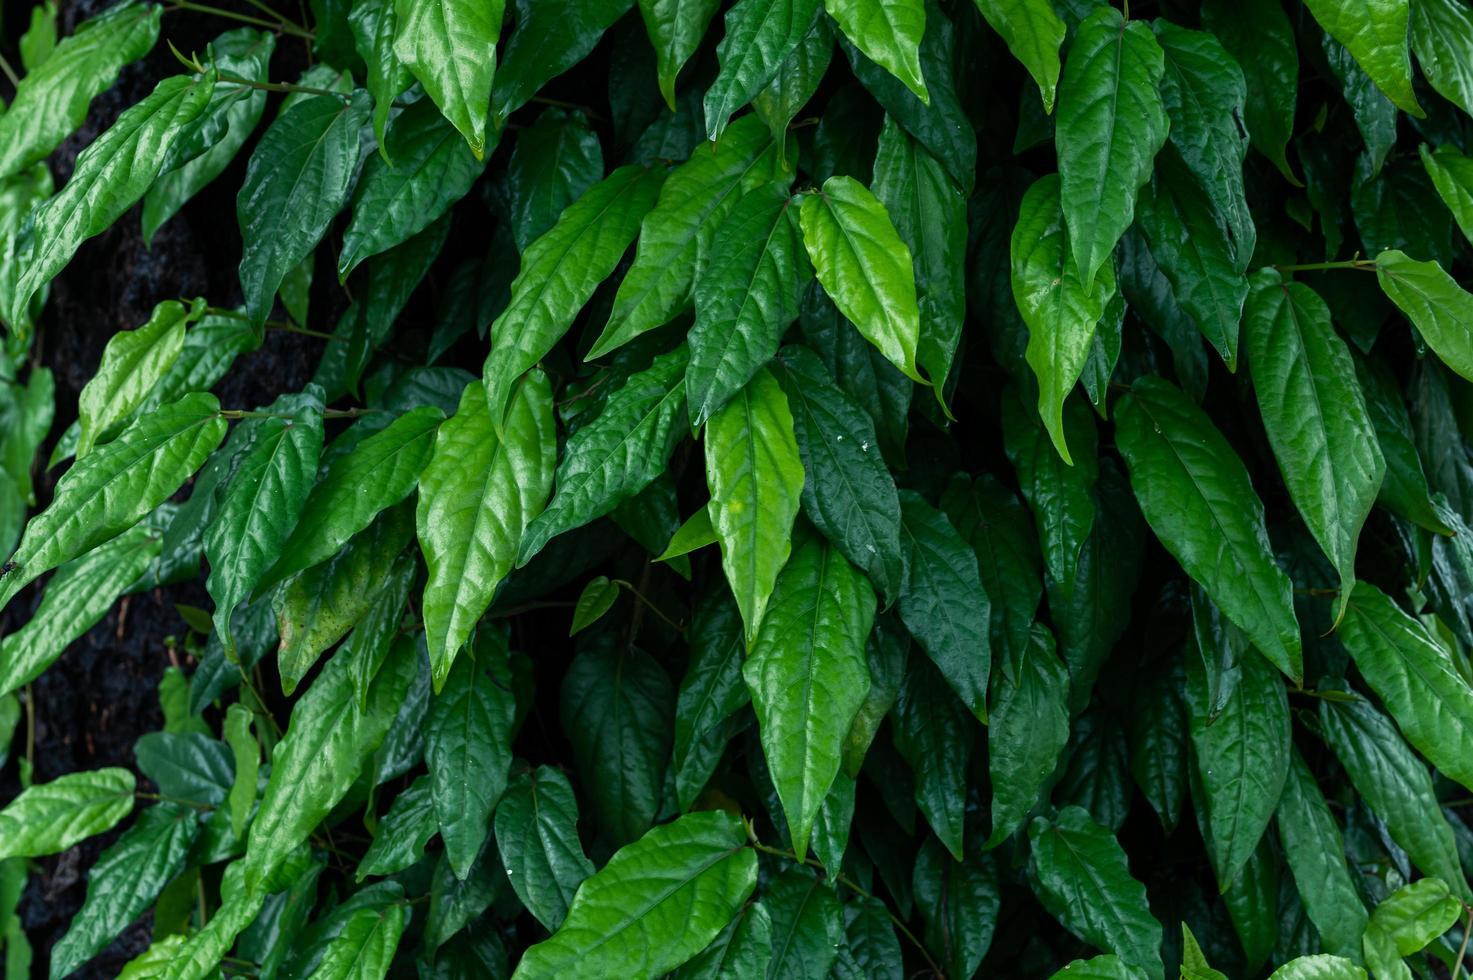 fondo de hoja verde hiedra foto